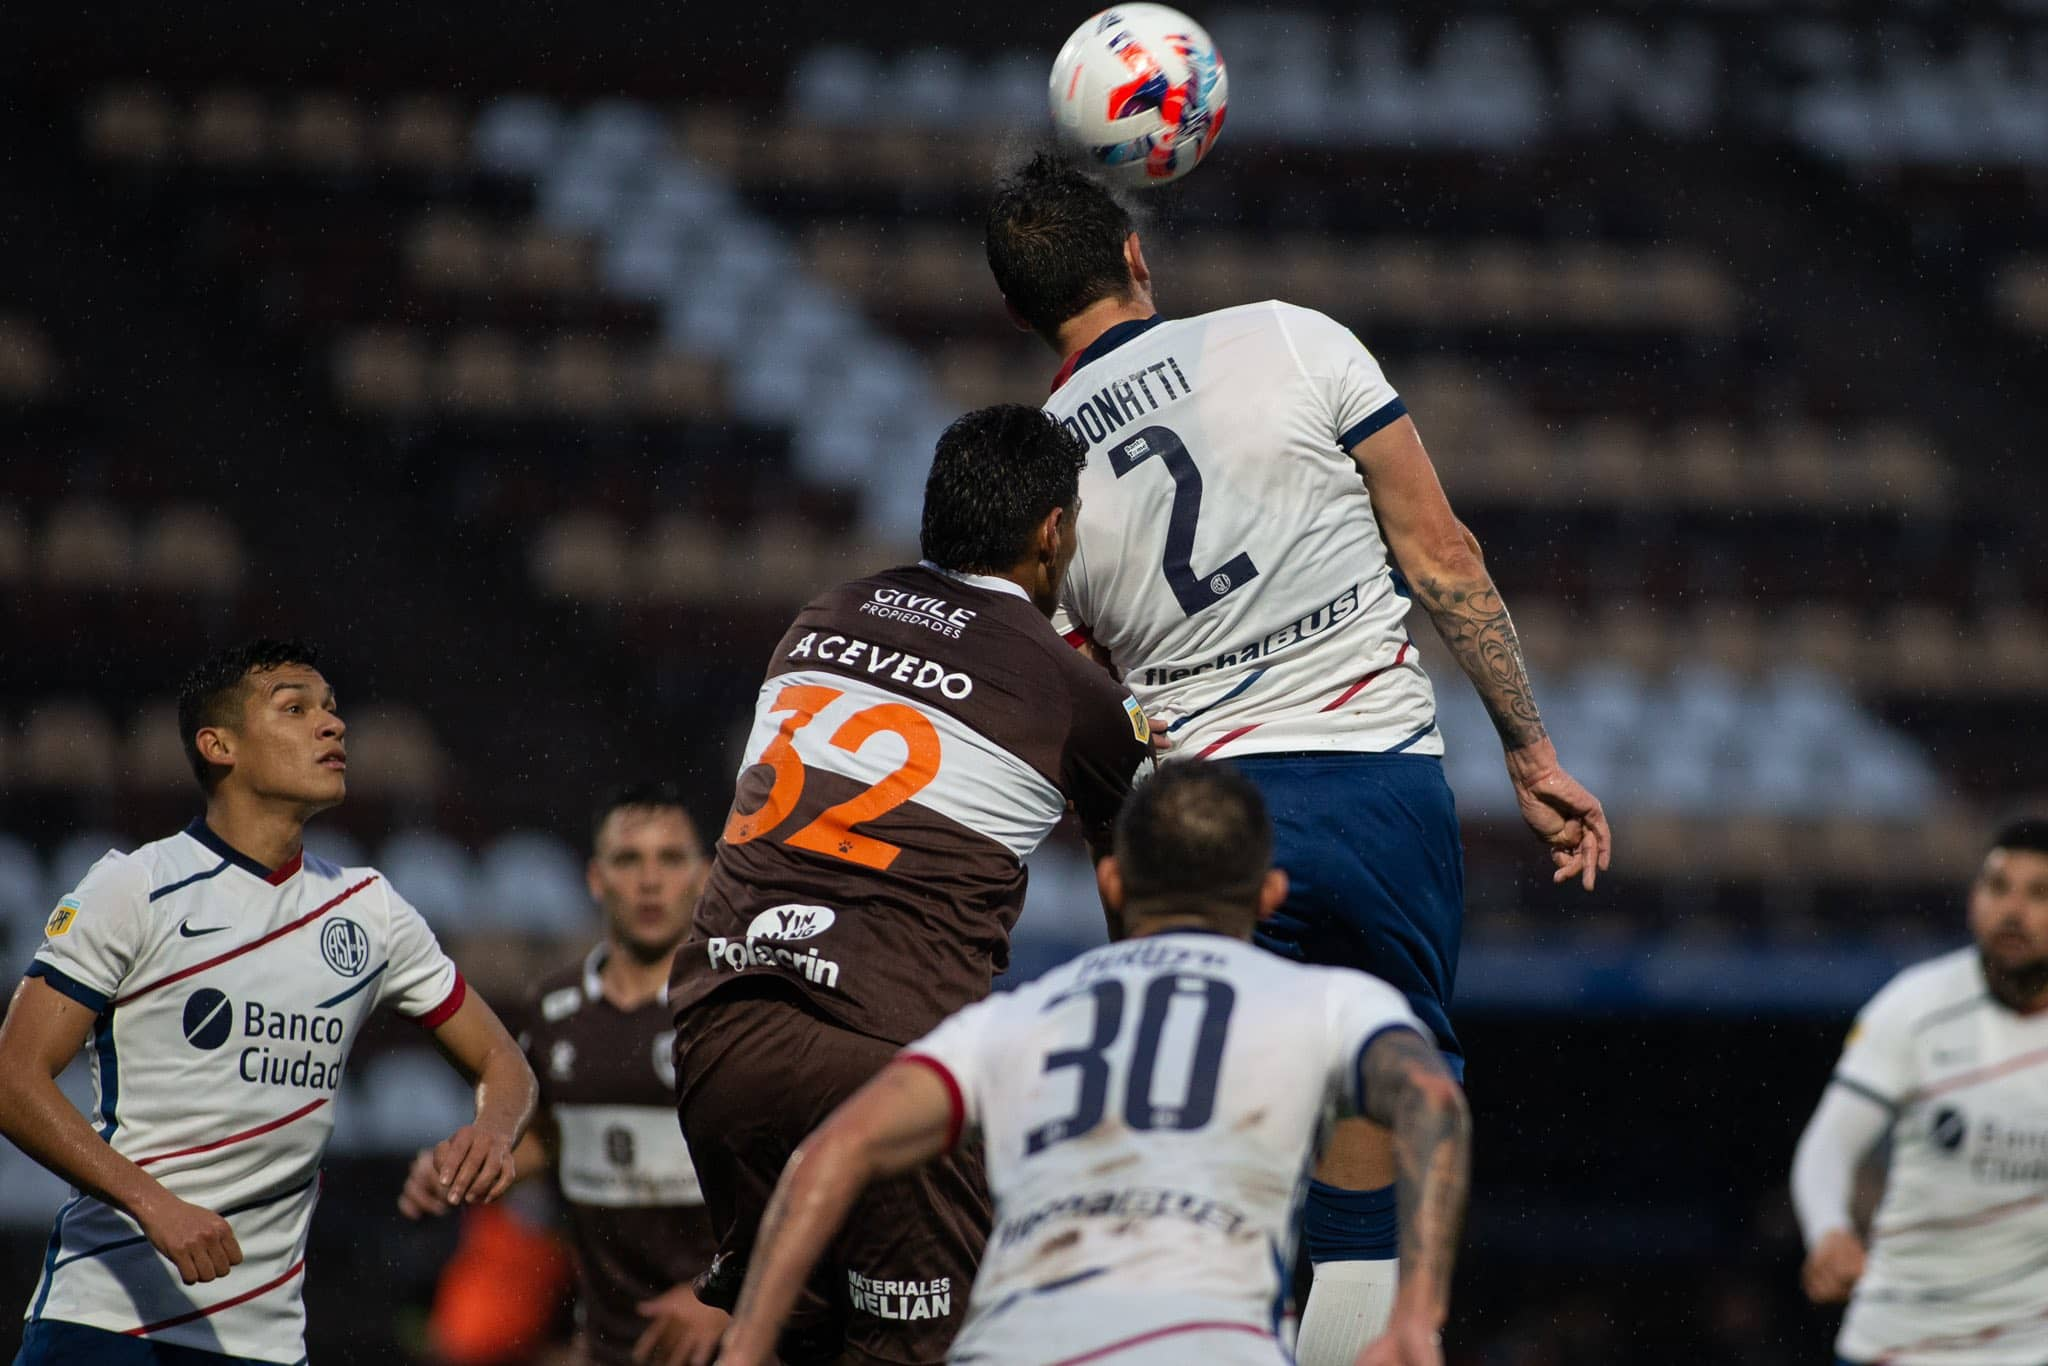 Platense y San Lorenzo igualaron en Vicente López por la Liga Profesional